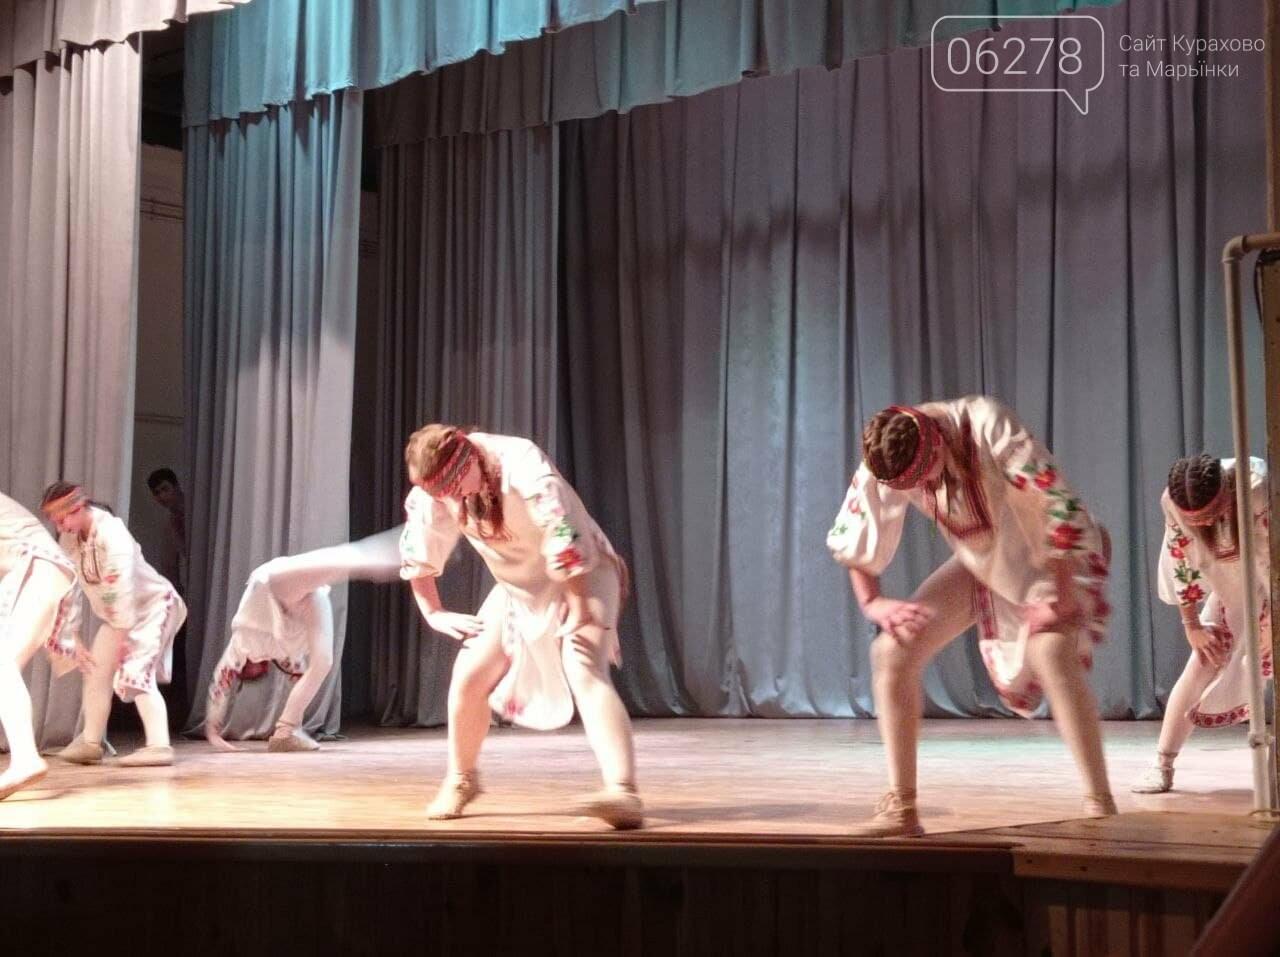 Концерт в Курахово 6 марта, Новости Курахово